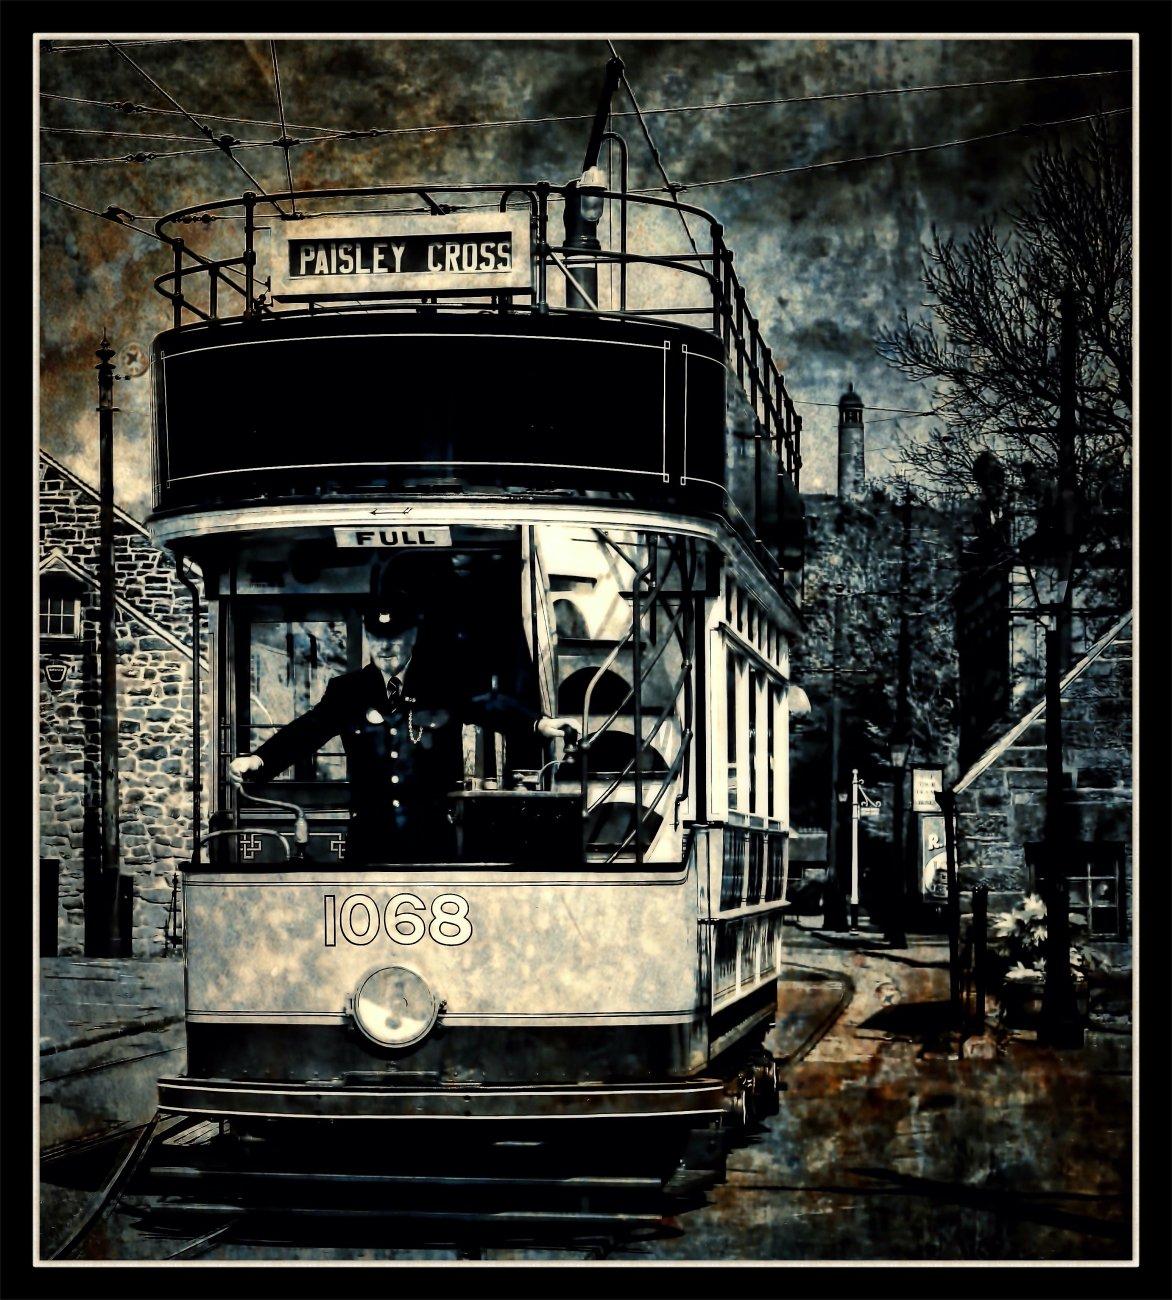 Manning the Tram